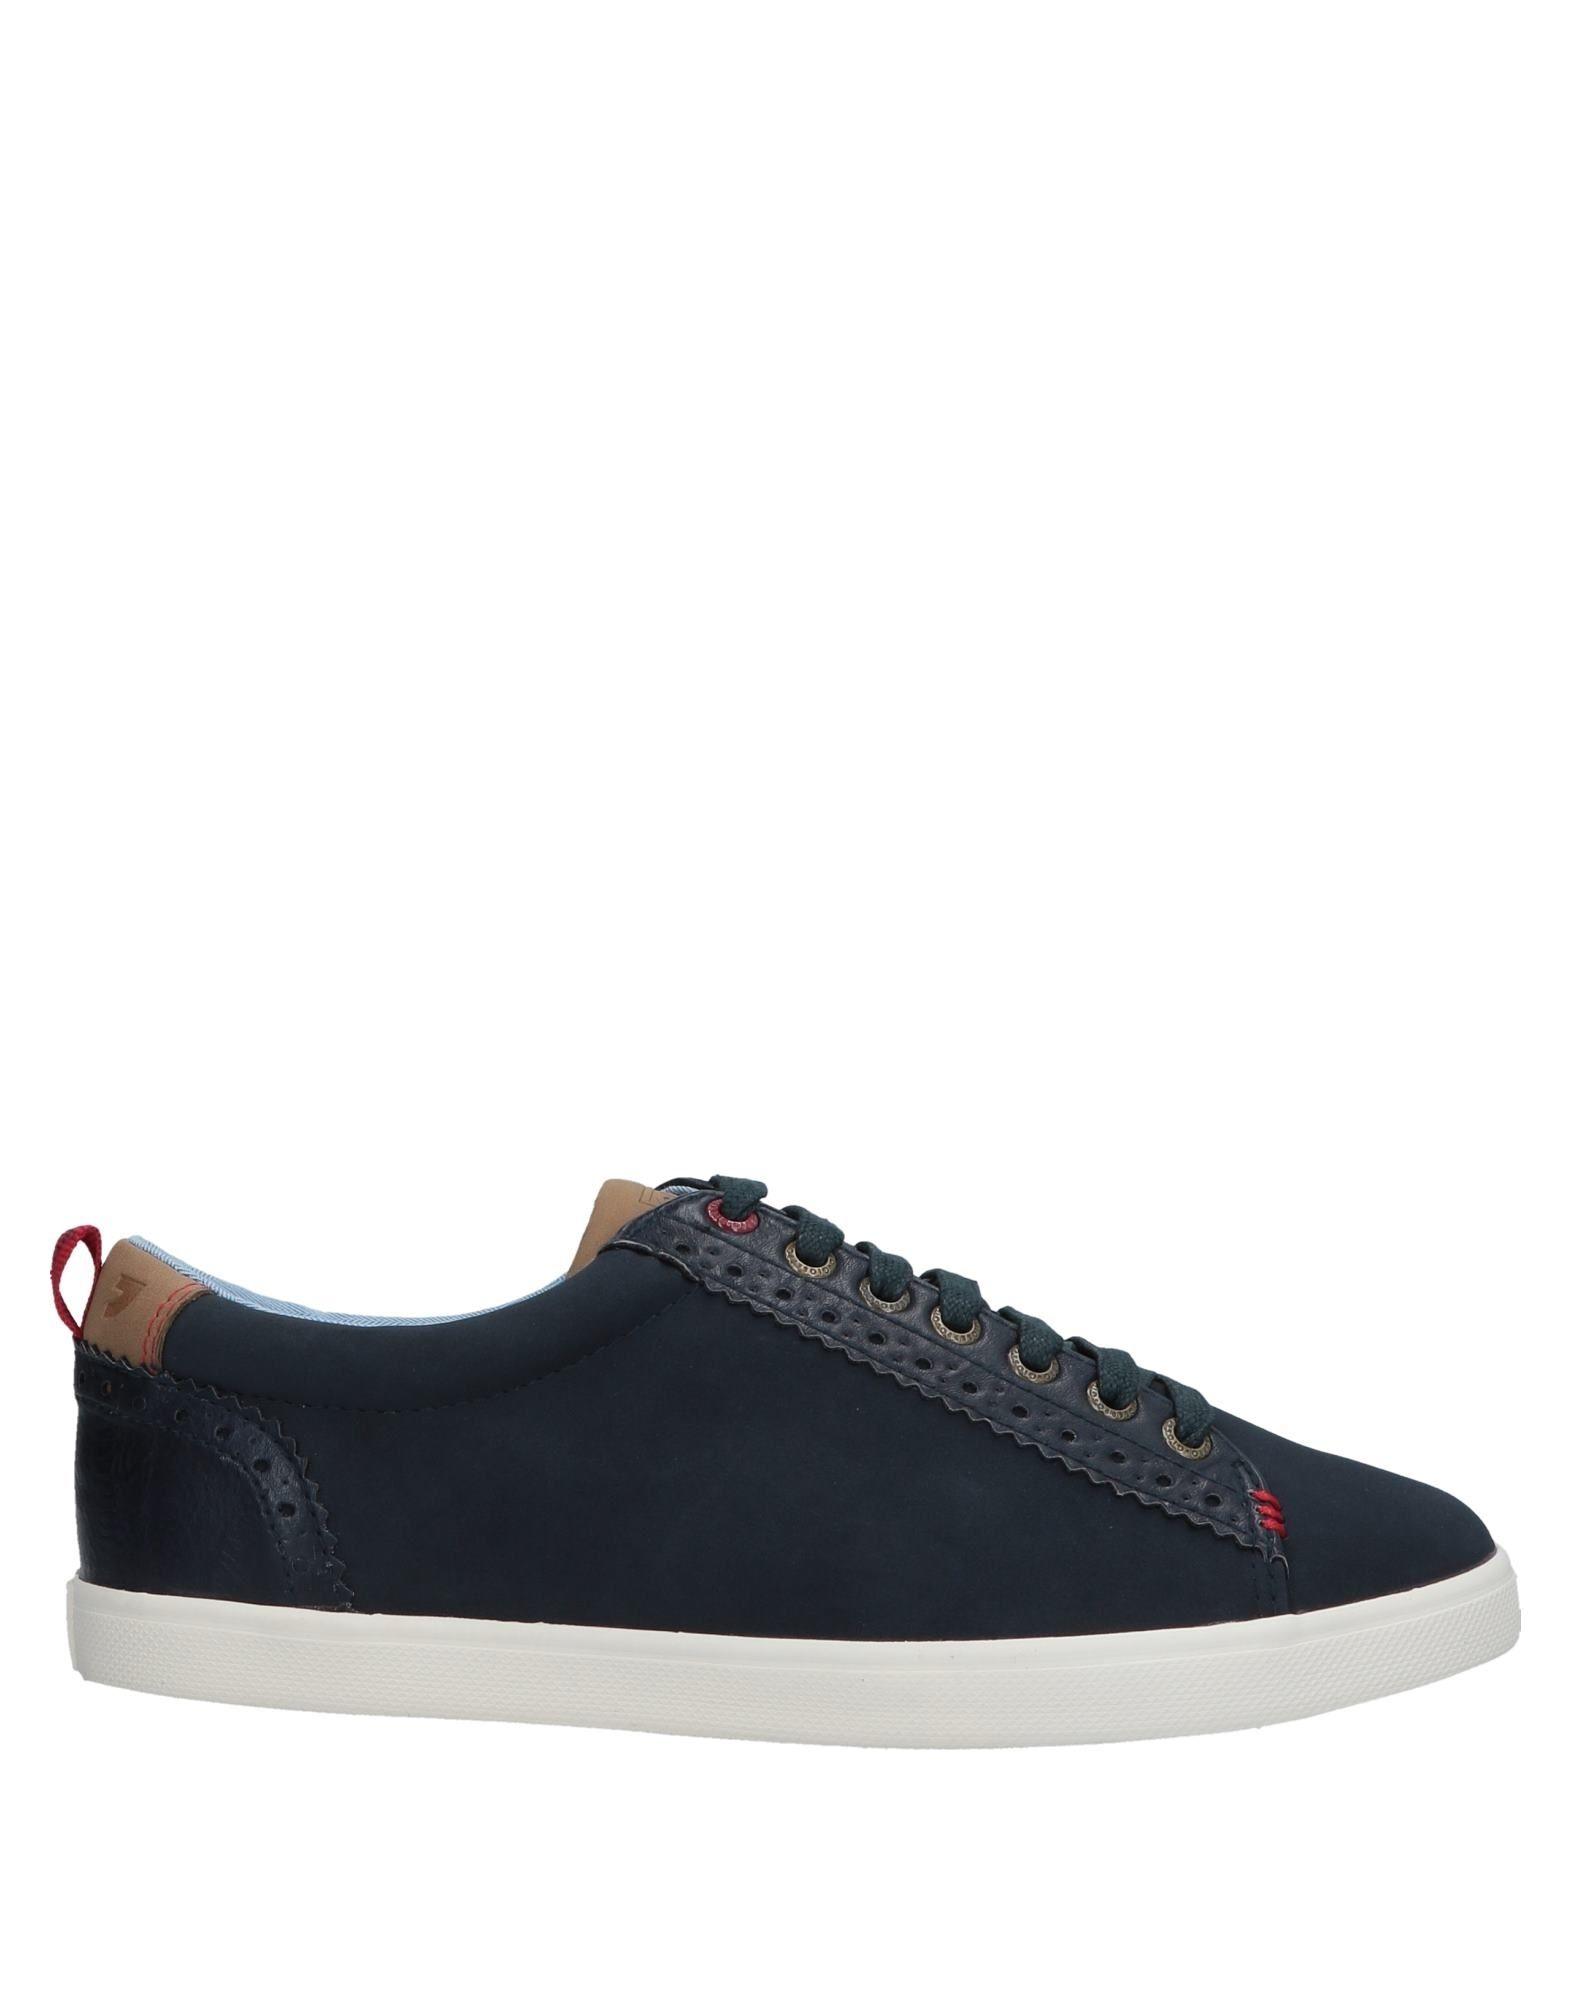 Gioseppo Sneakers - Men Gioseppo Australia Sneakers online on  Australia Gioseppo - 11574409ML 2b00d7